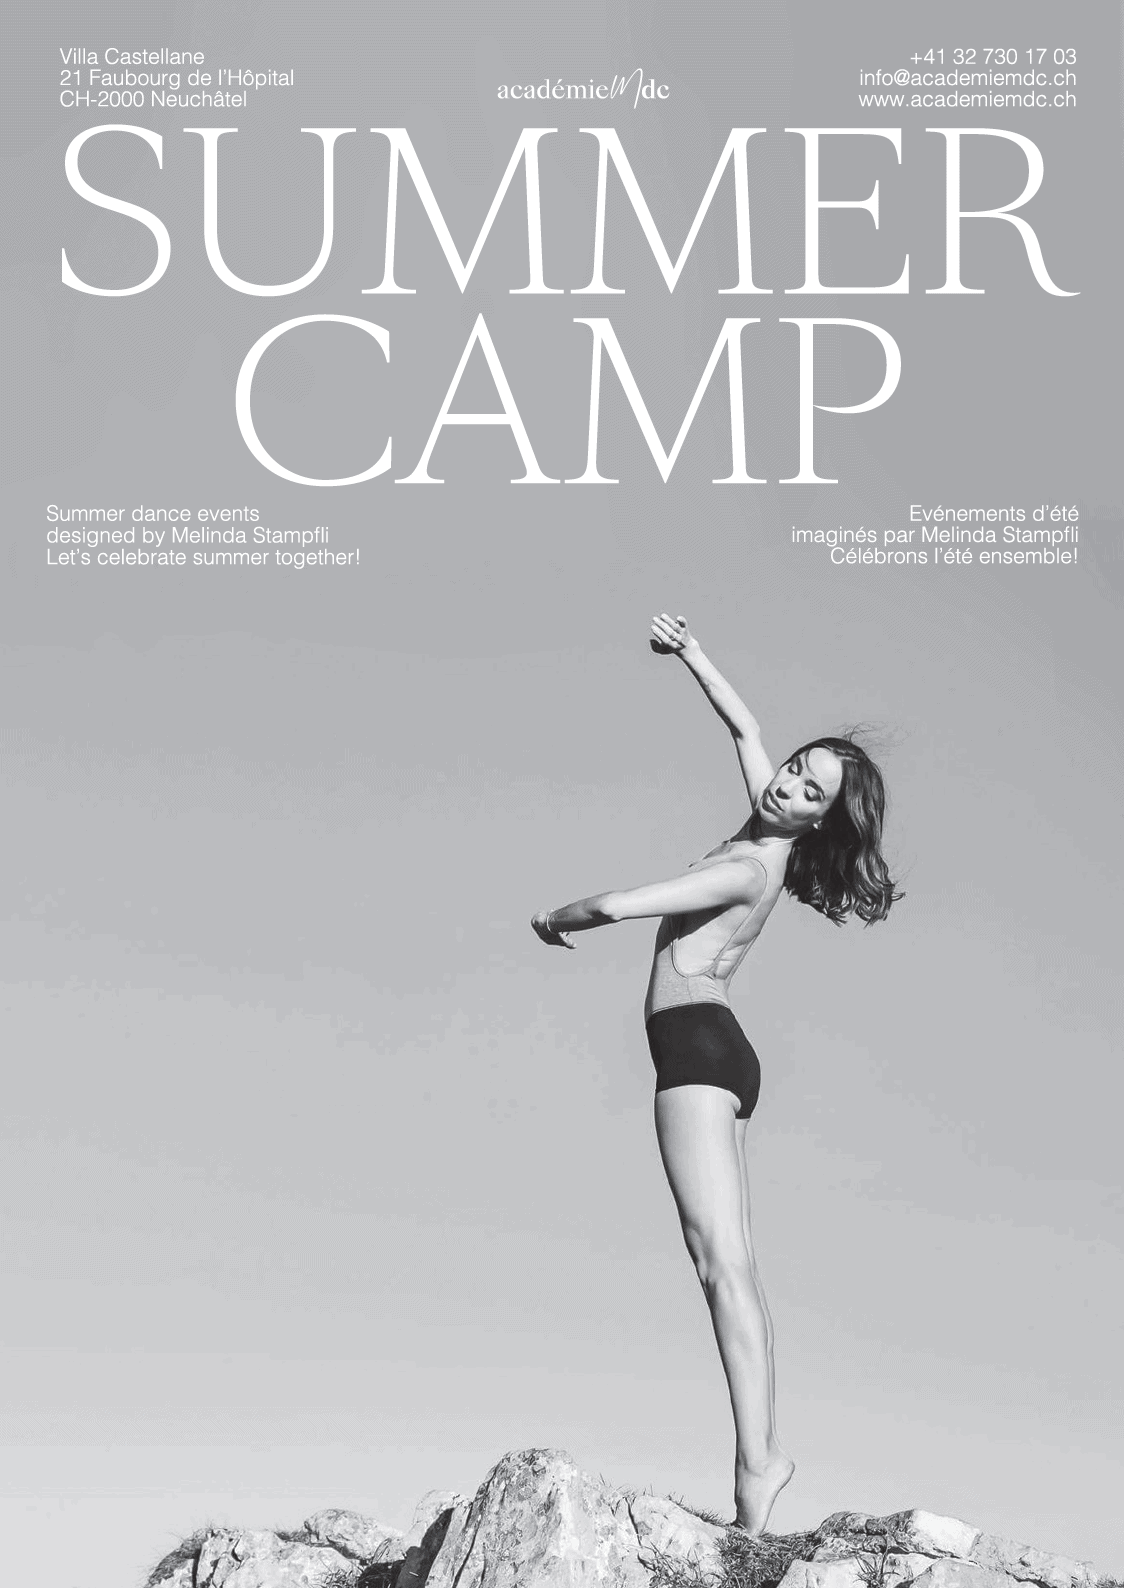 Summer Camp Académie MDC